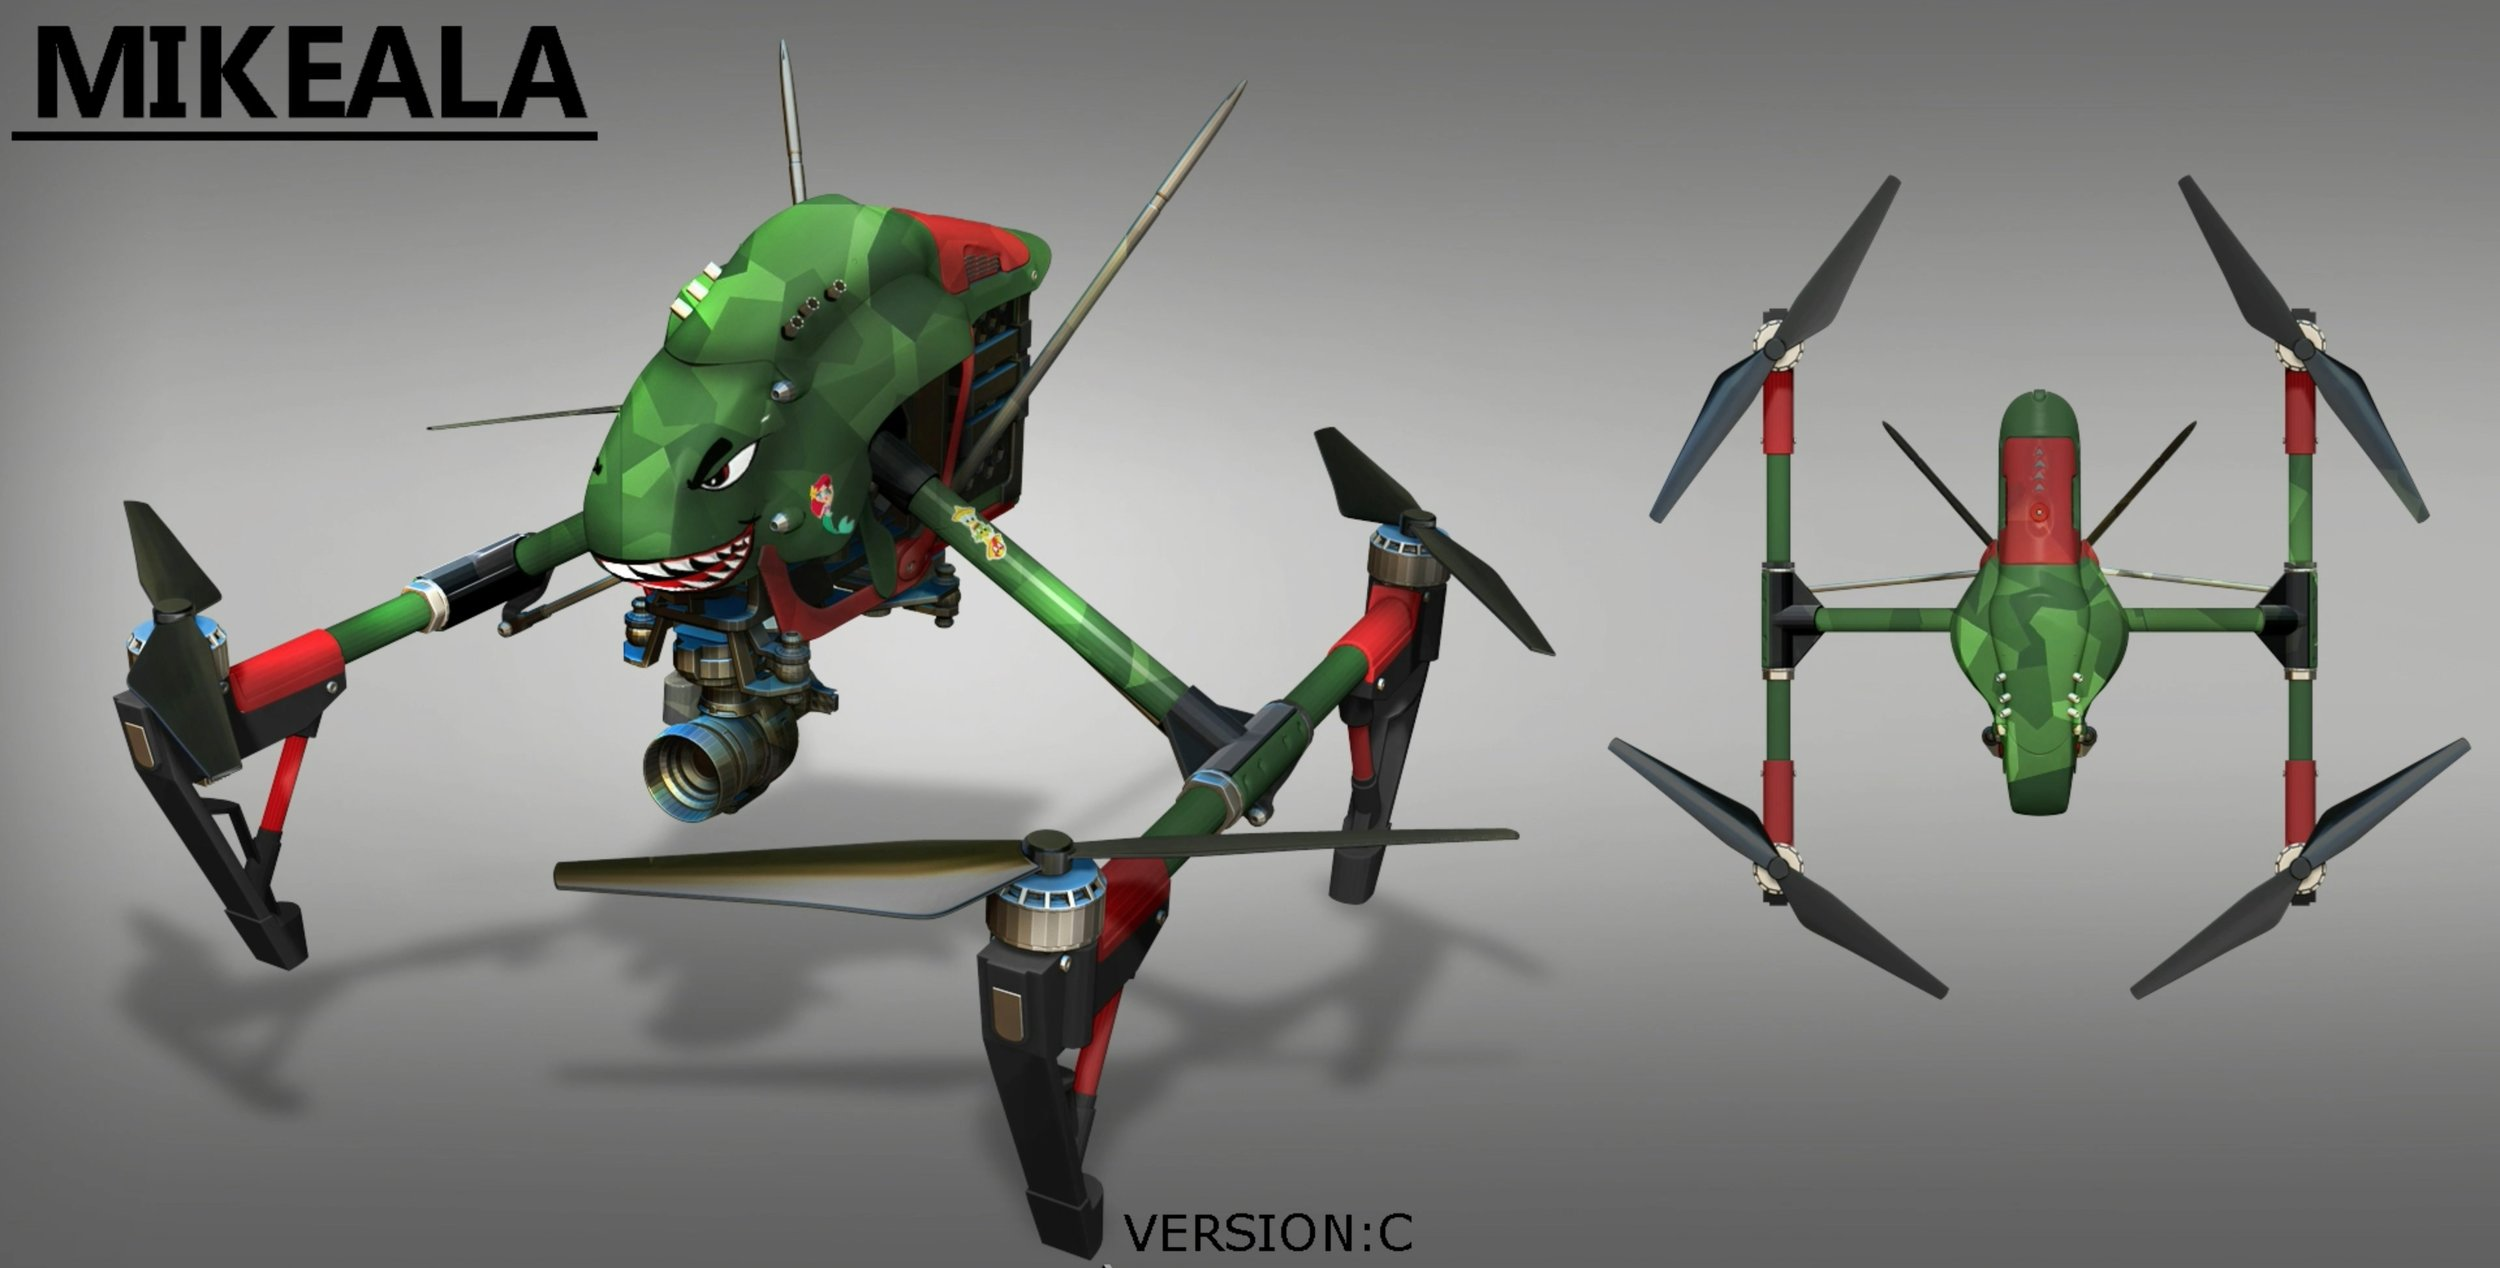 Nissan Drones - 11.jpeg